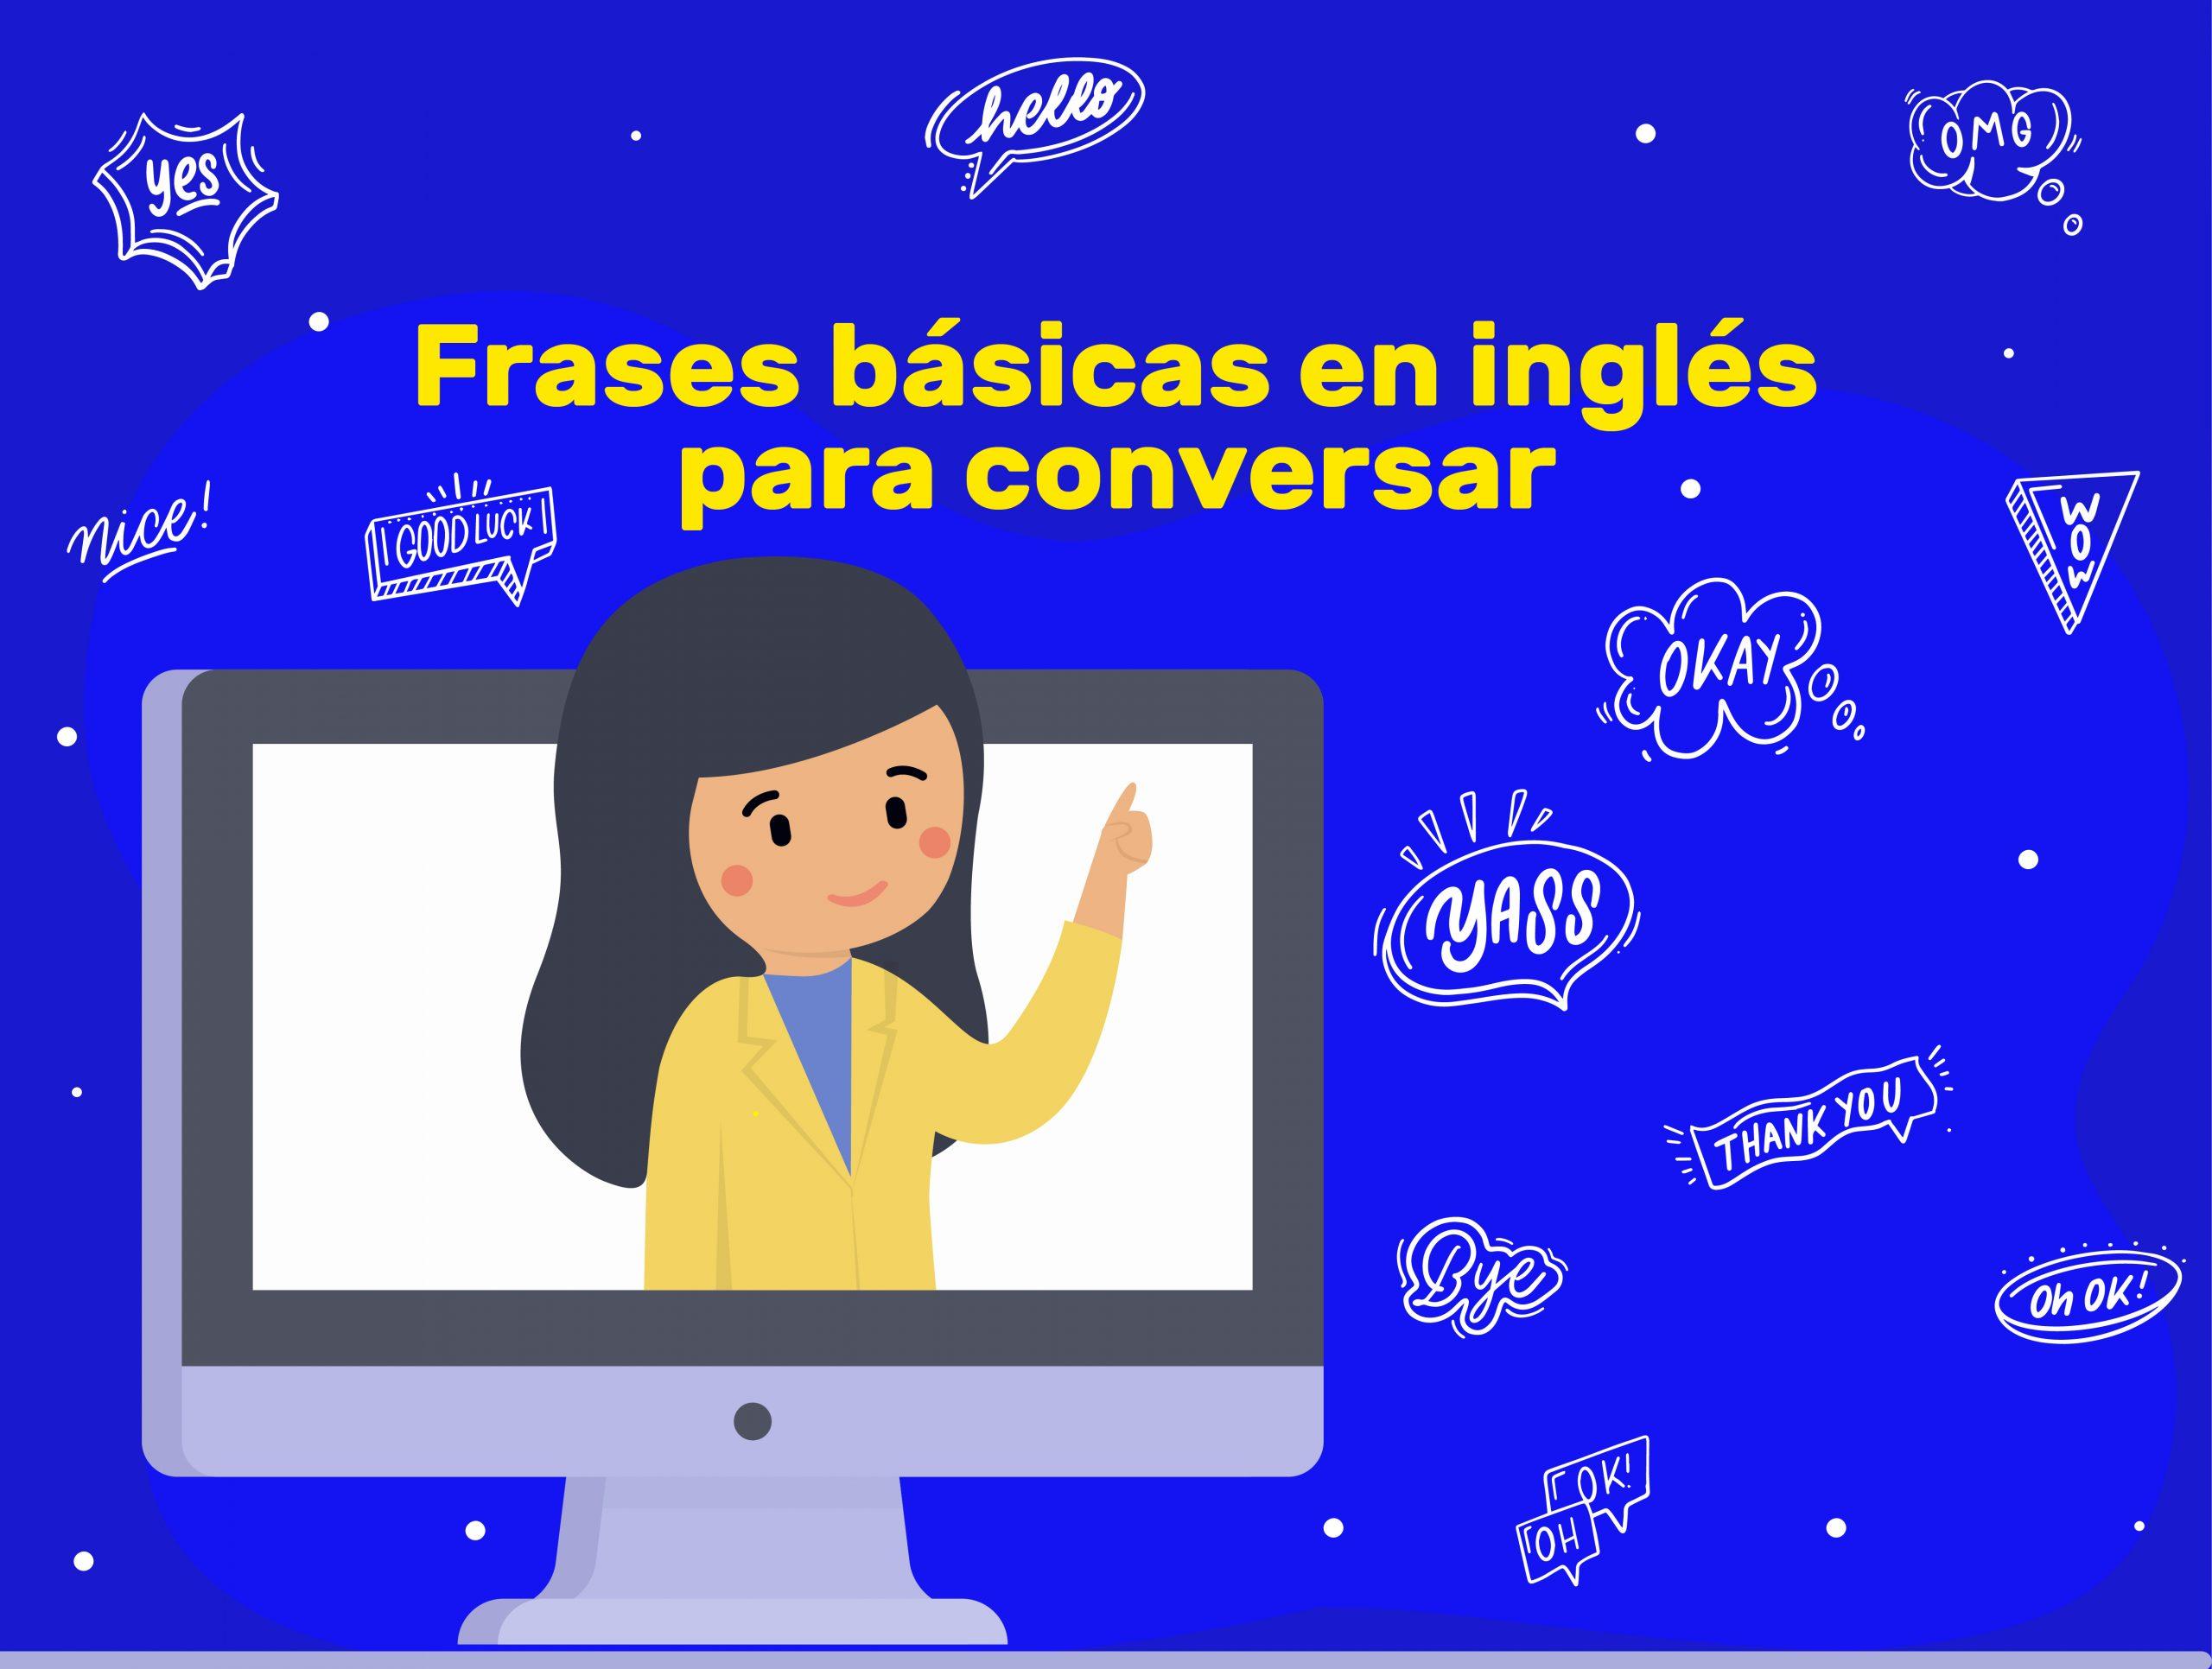 Frases básicas en inglés para conversar